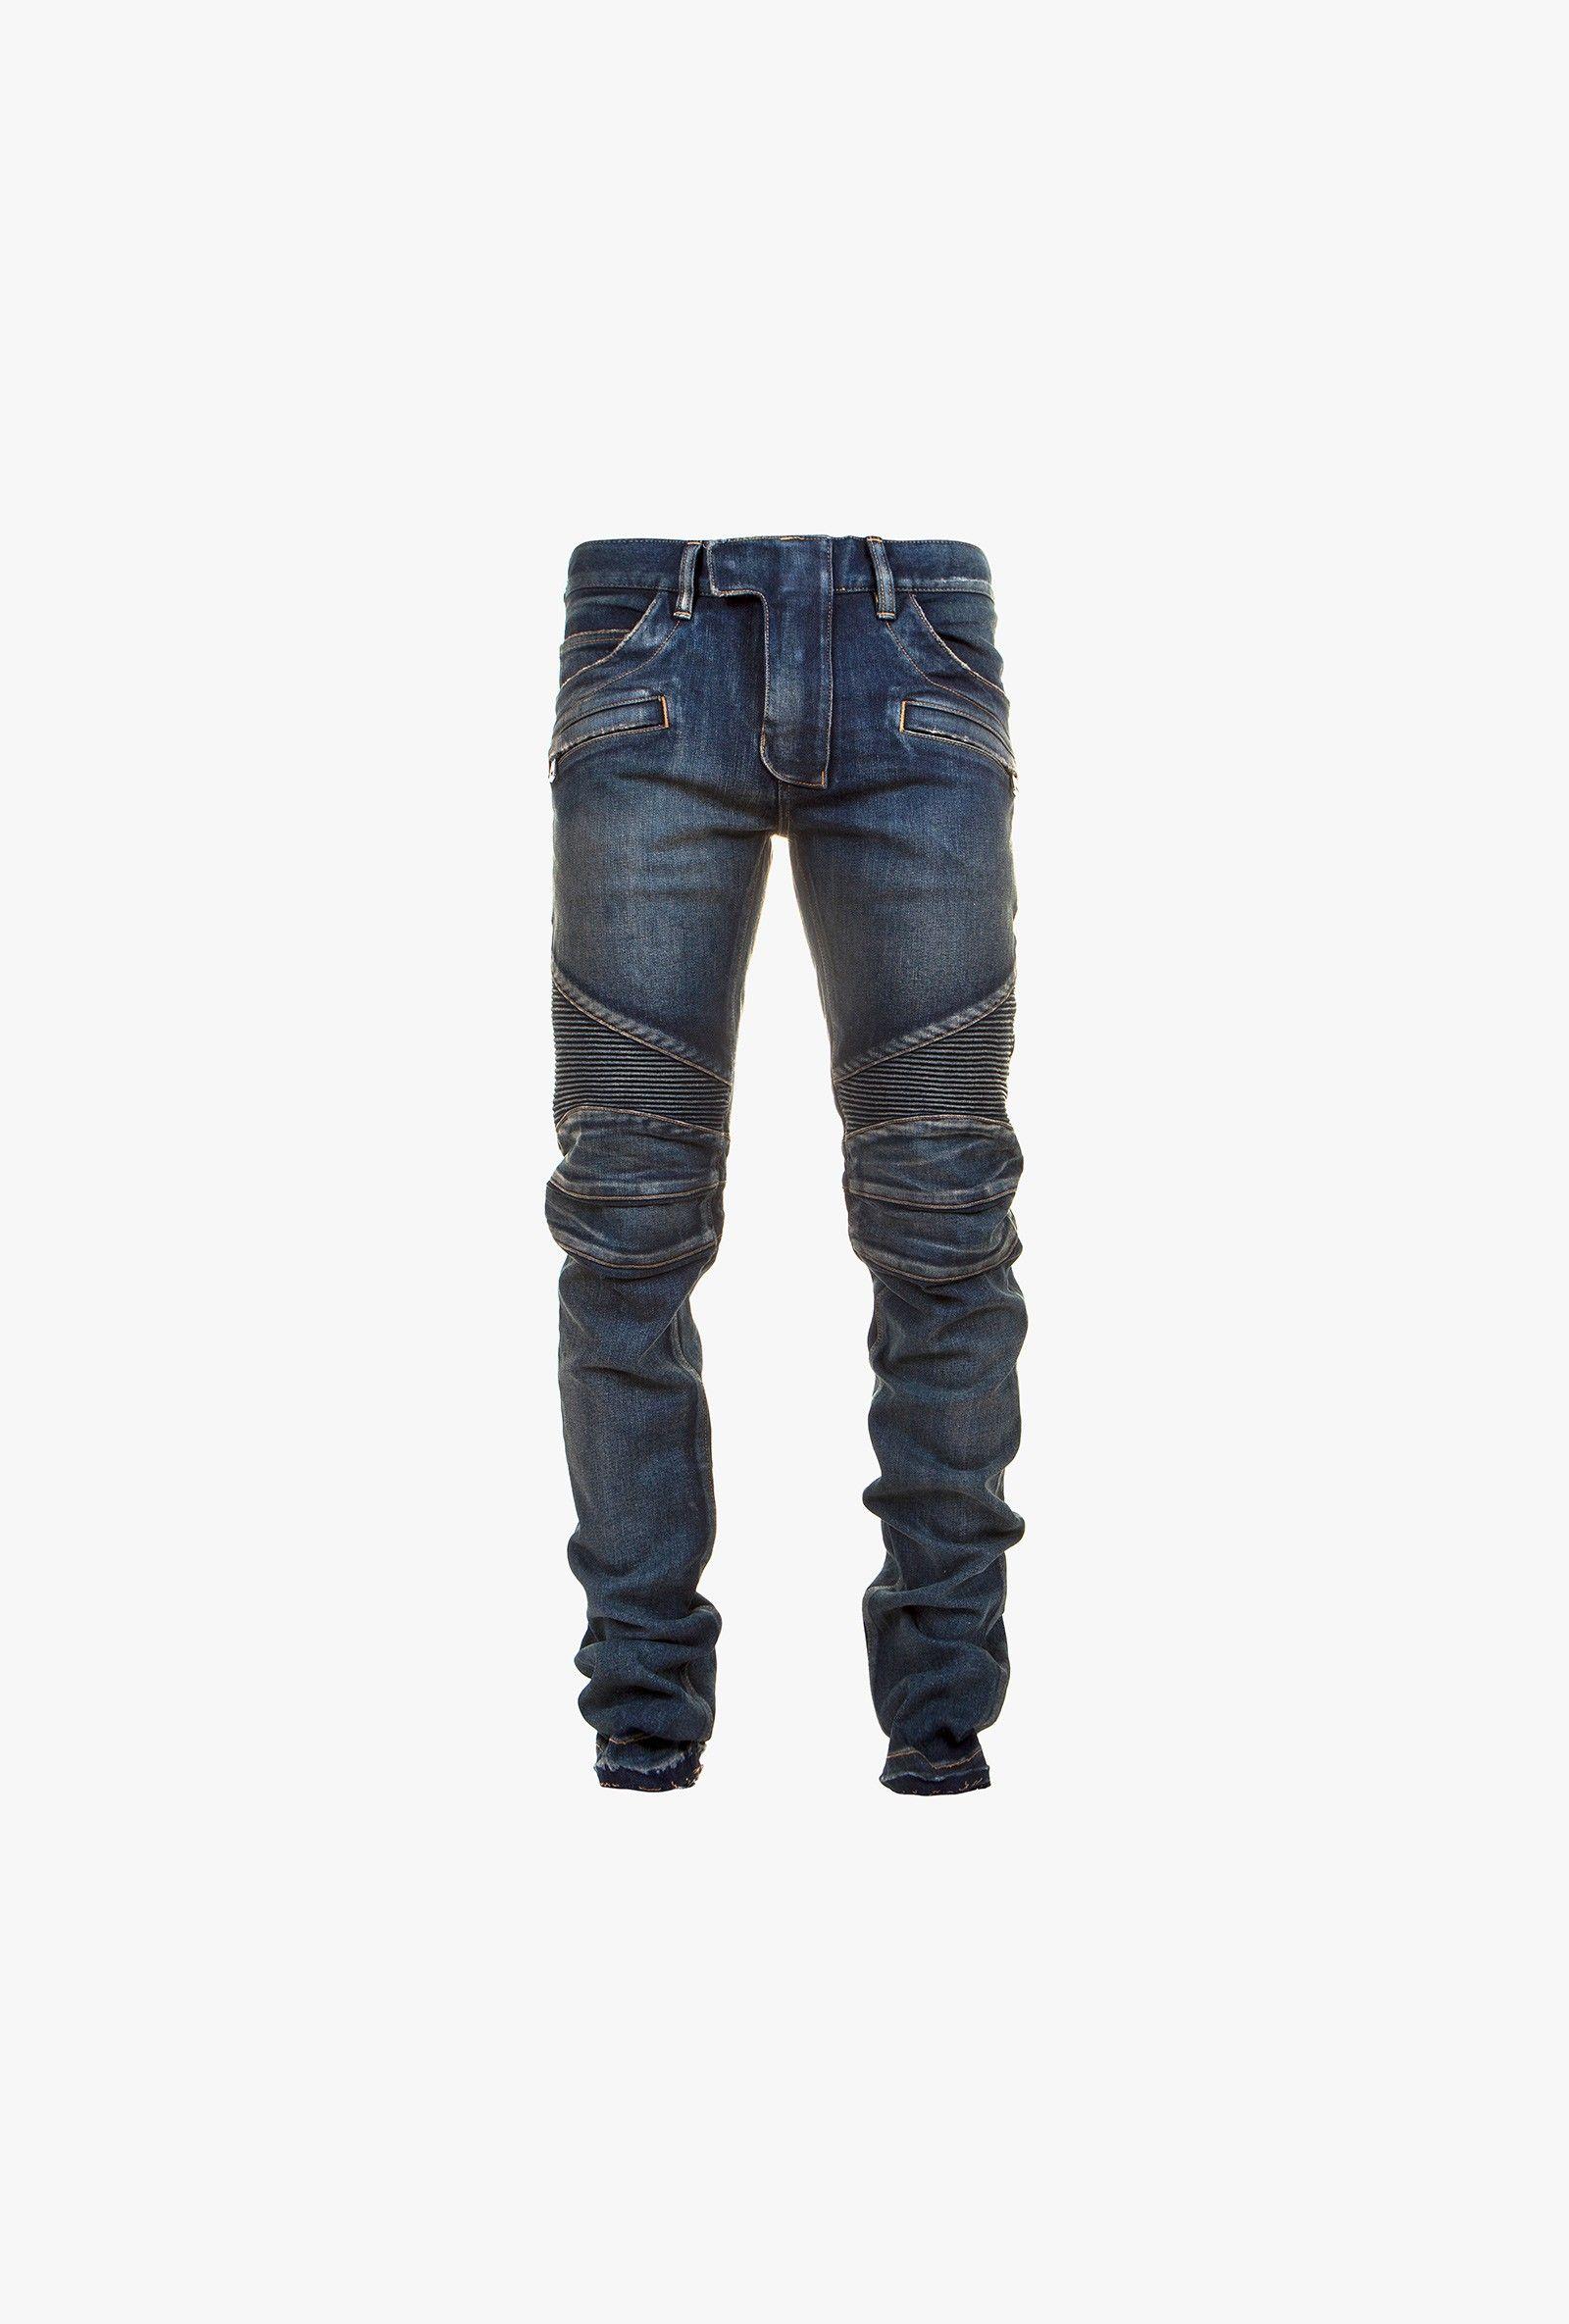 9cd741116c2 Balmain - Regular-fit stretch cotton denim biker jeans - Mens biker jeans